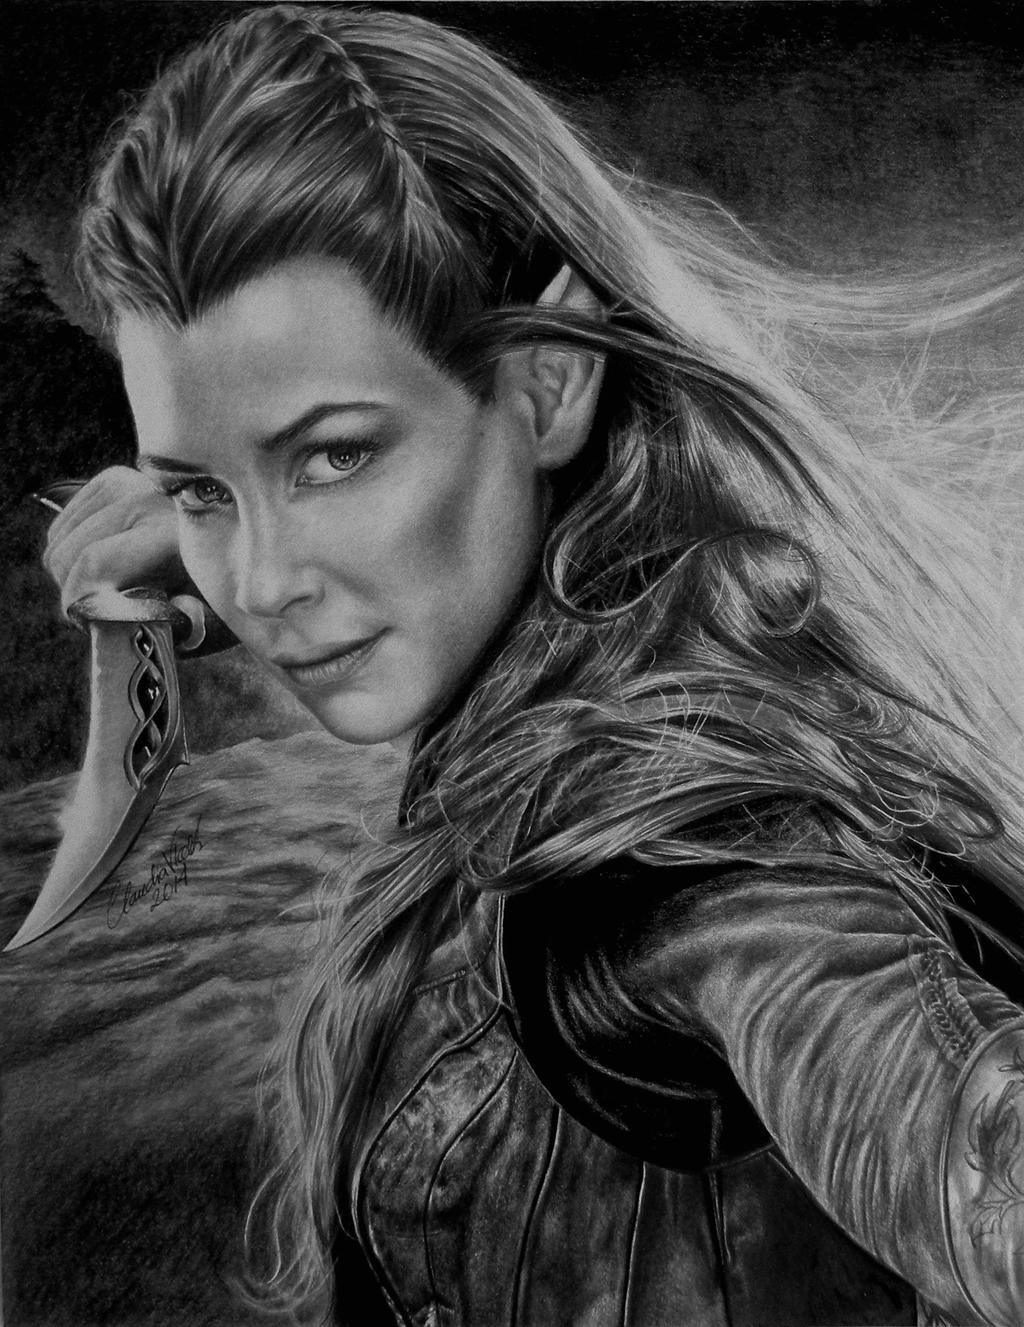 Daughter of Mirkwood by riverstyx27